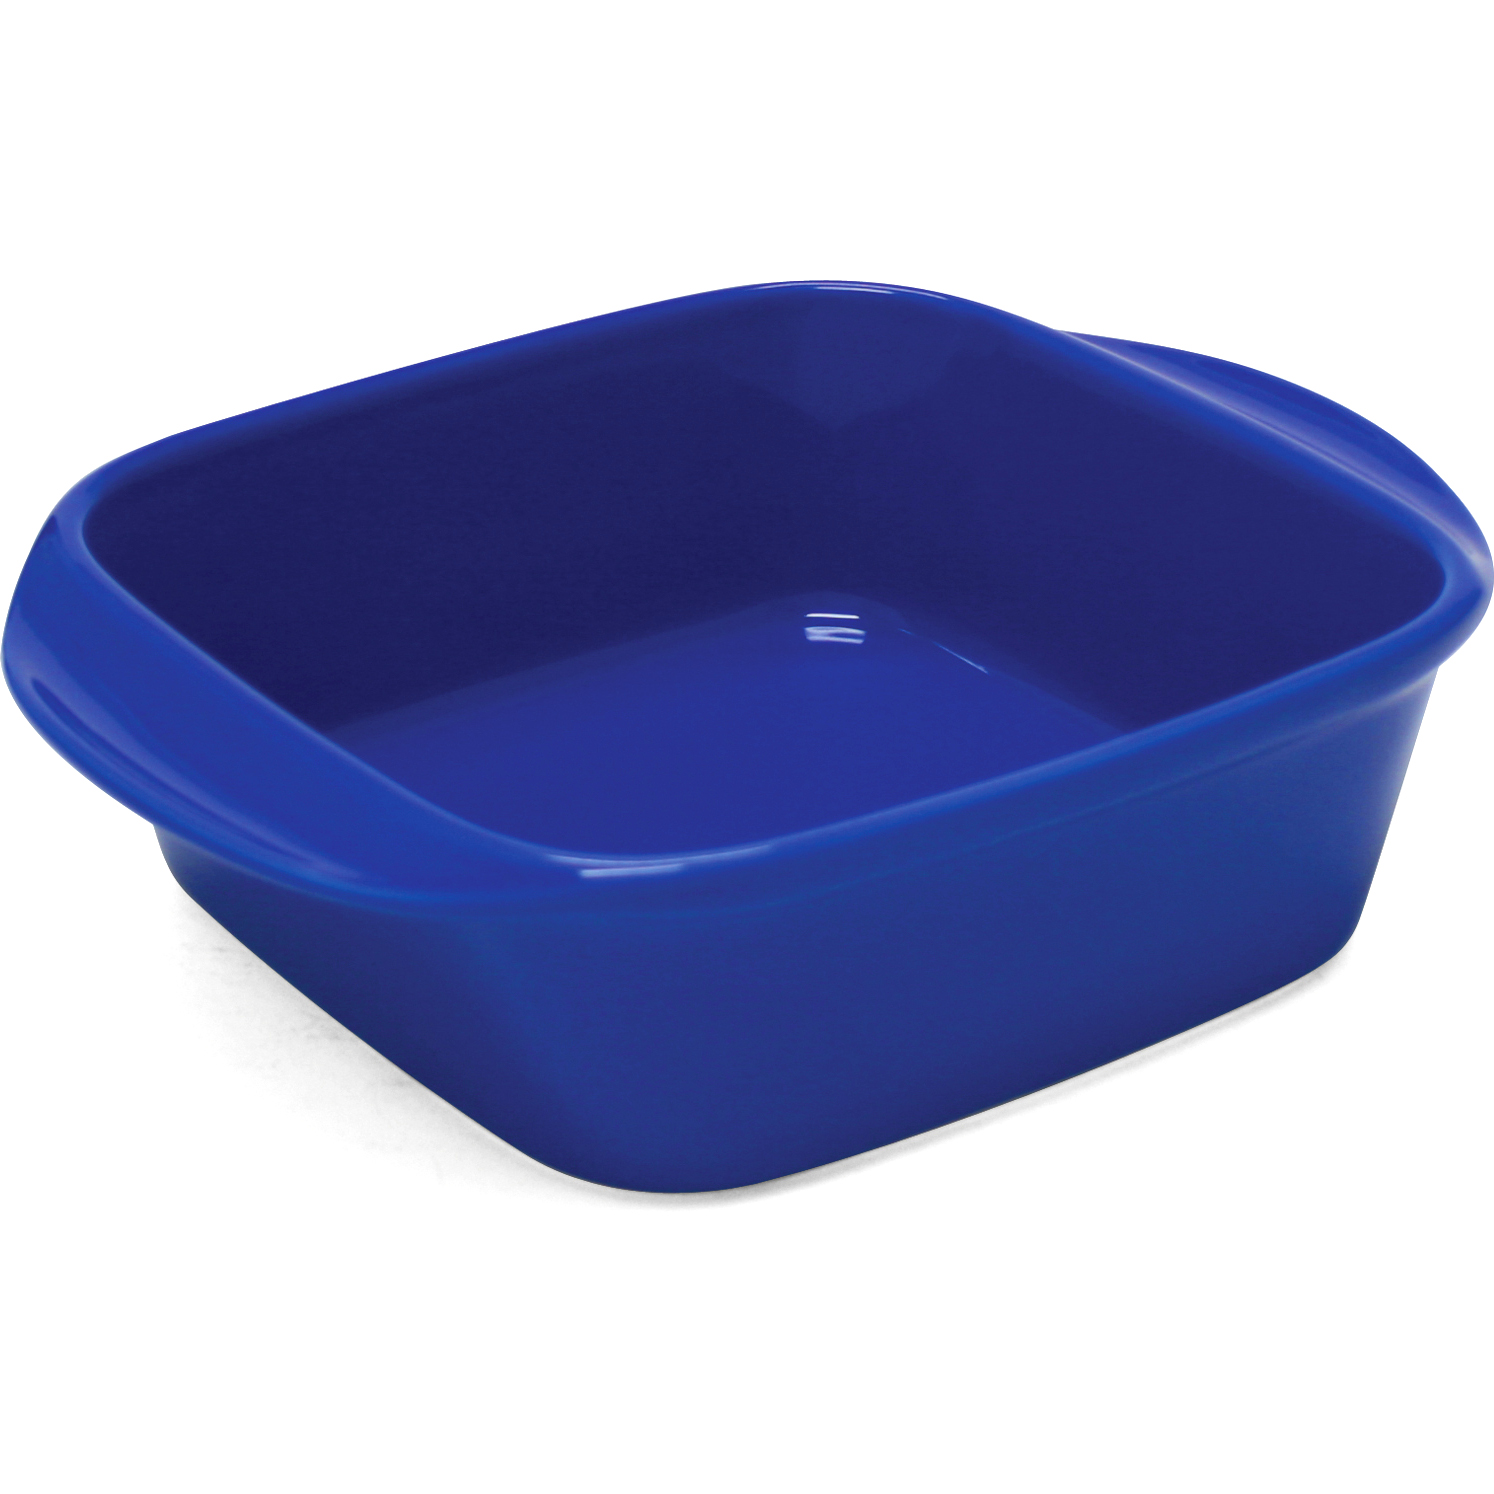 Chantal Indigo Blue Classic Square Baking Dish, 8 Inch